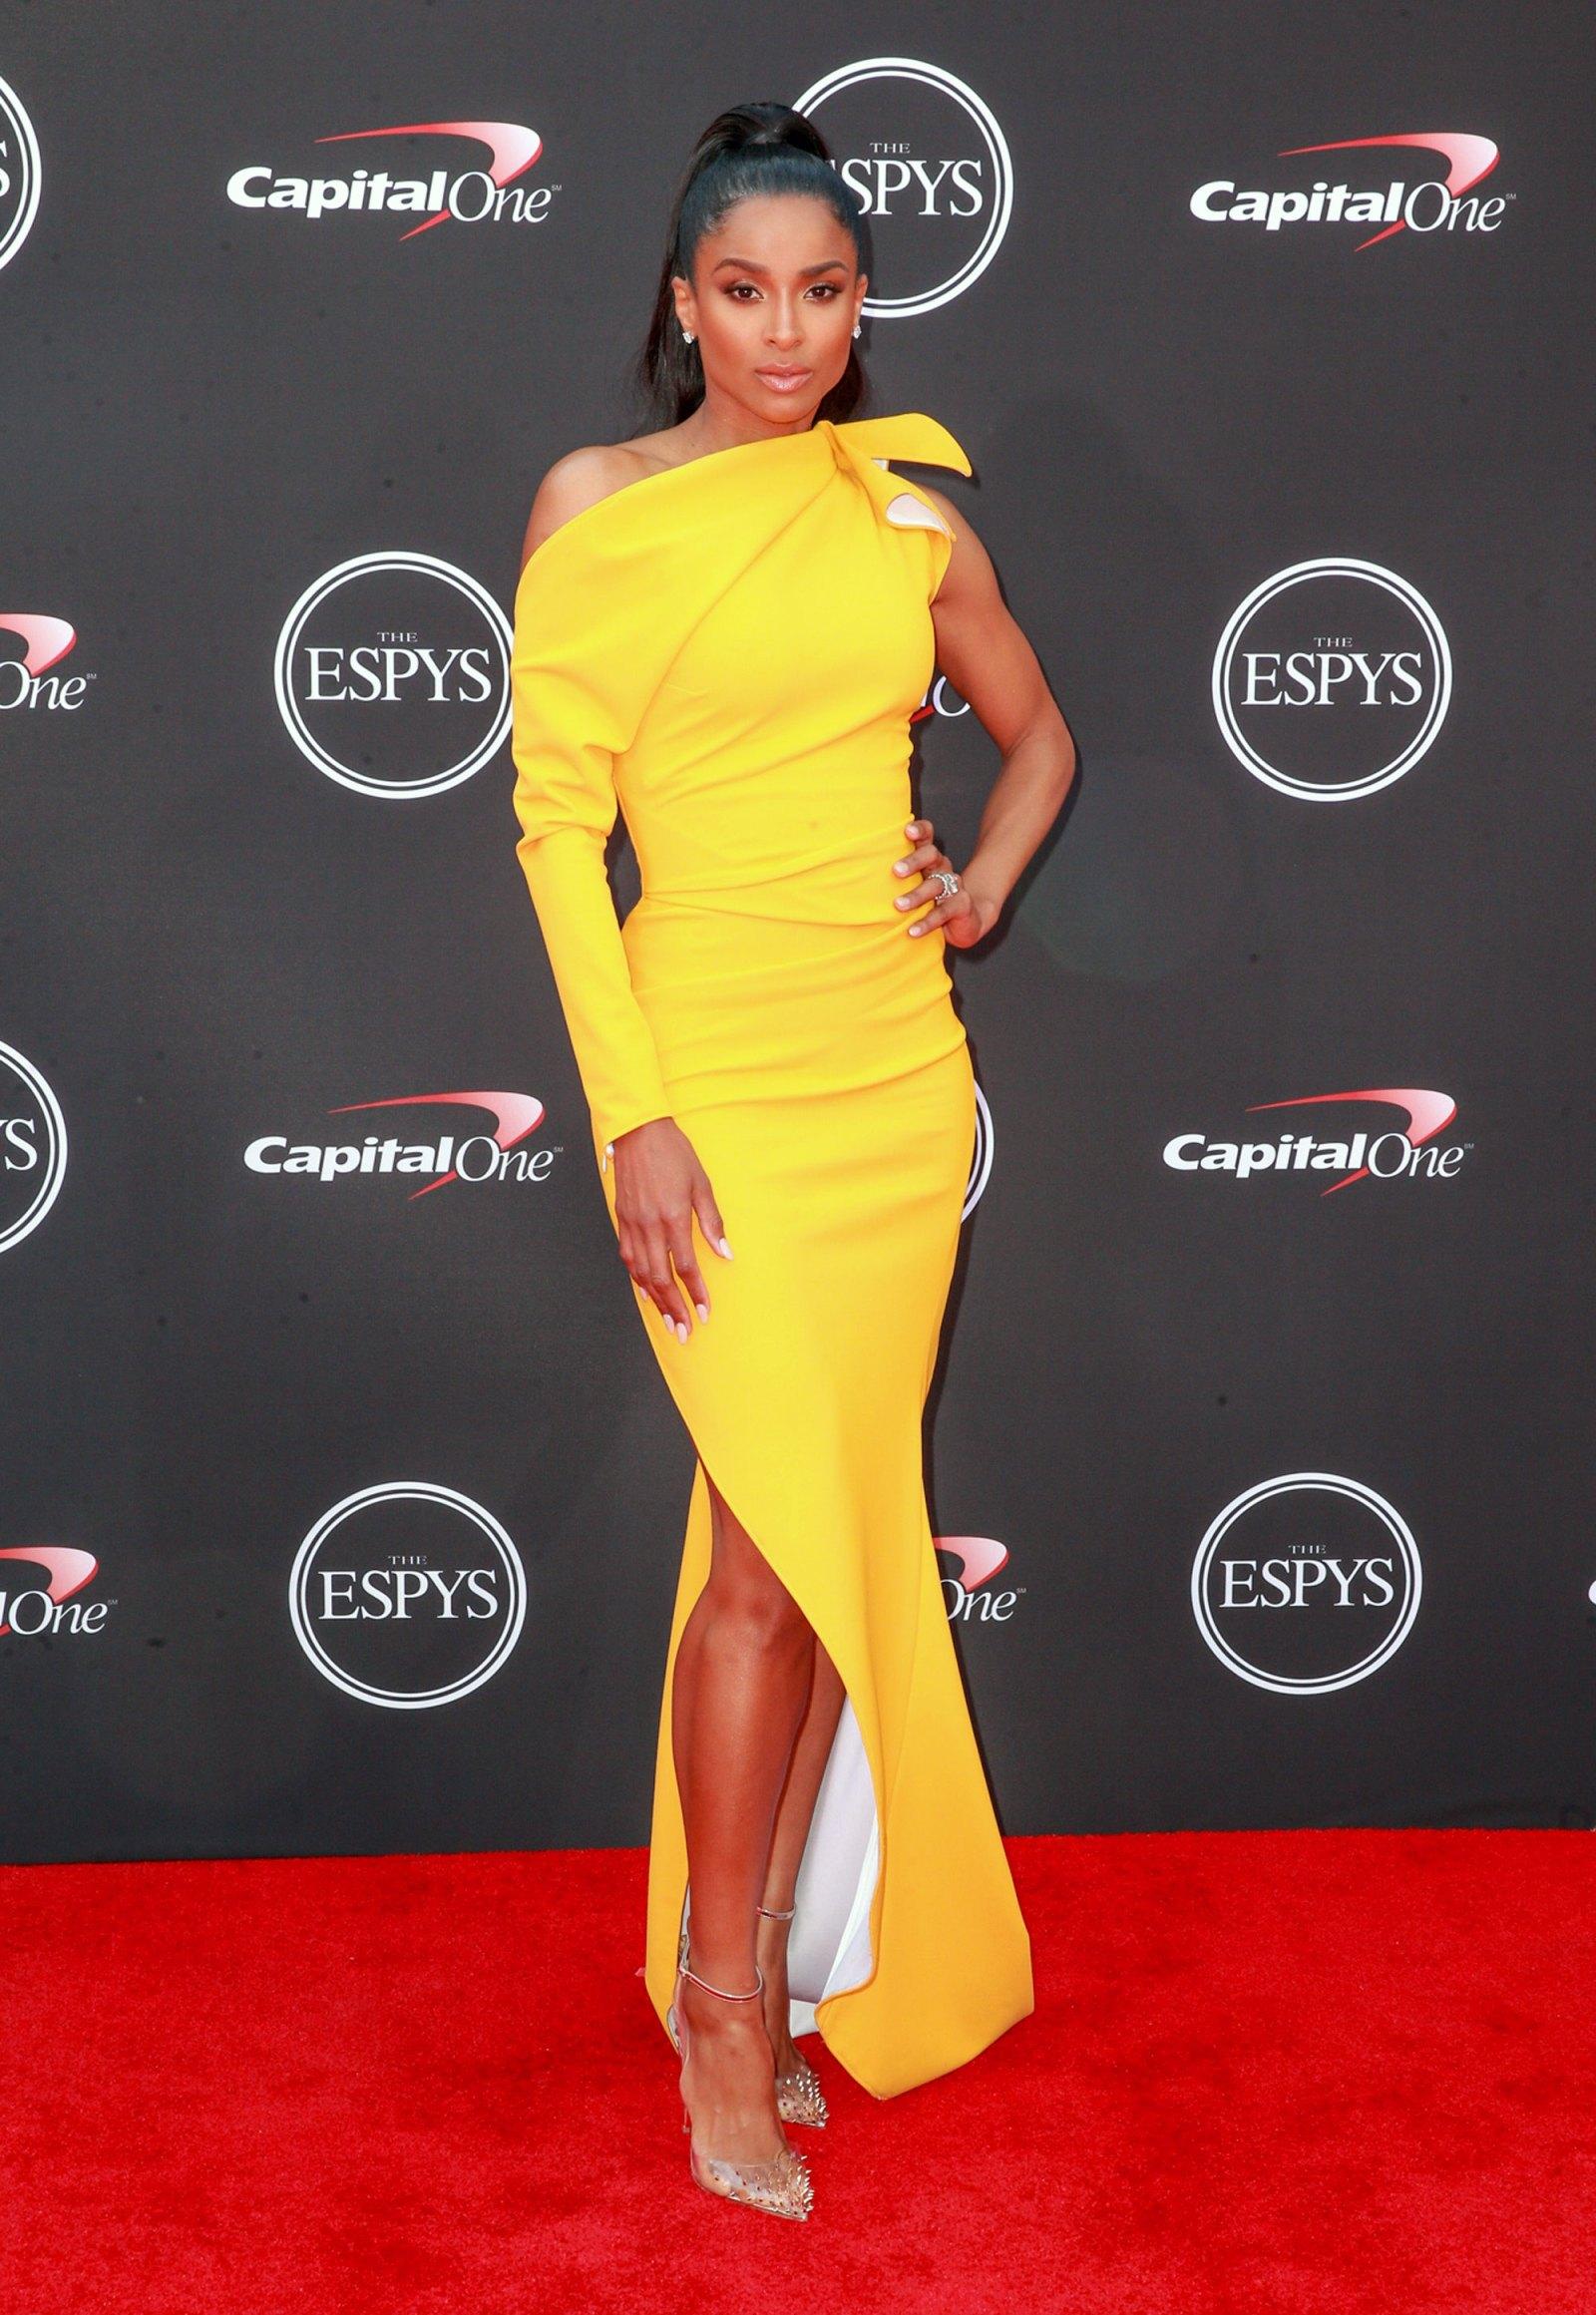 ESPYs Awards/Ciara